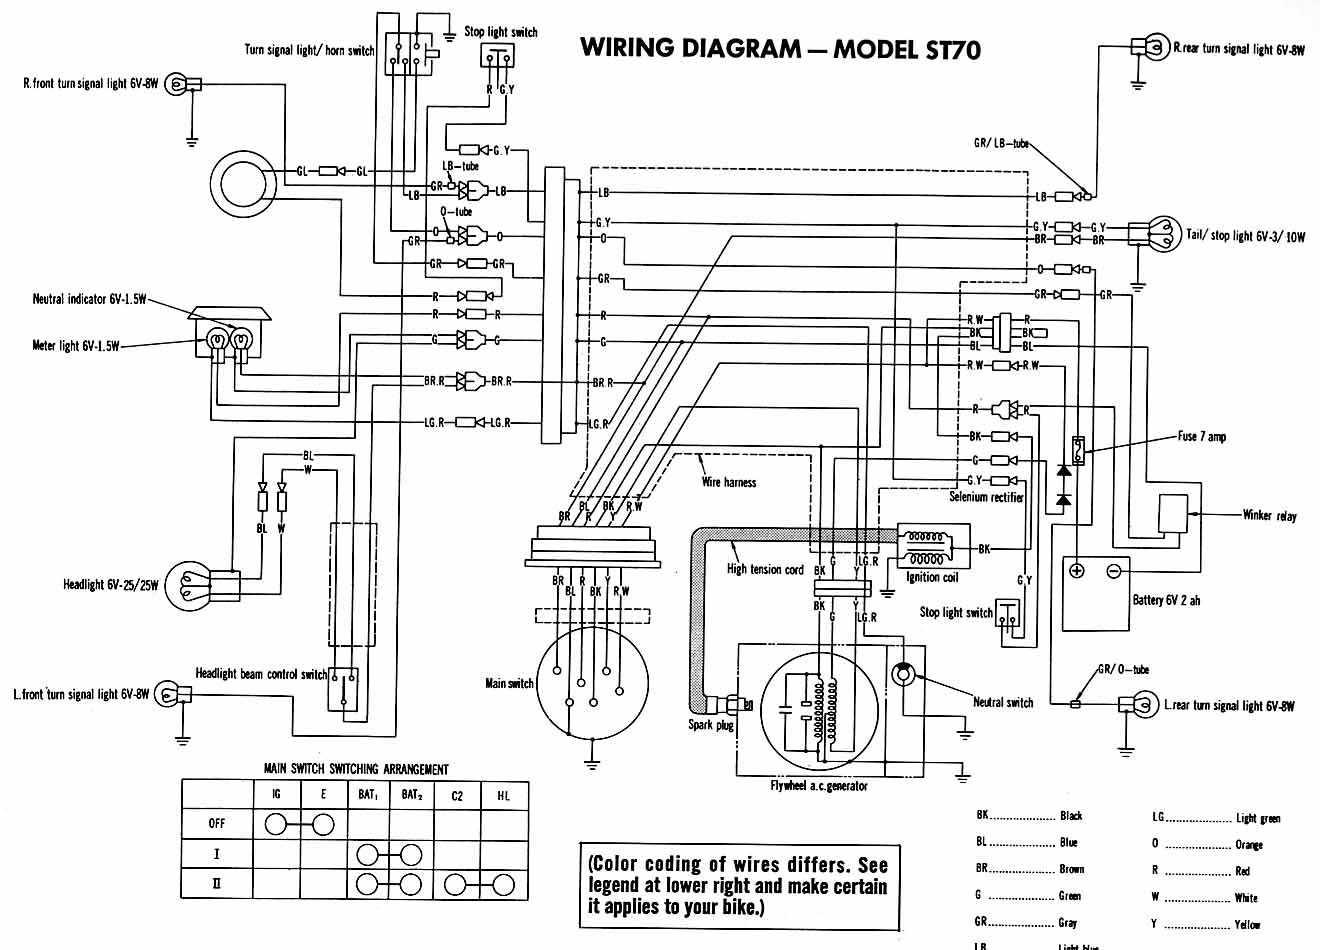 Charmant 1985 c70 wiring diagram zeitgenssisch elektrische honda c70 wiring diagram wallpapers harvard wire diagrams 2000 e350 cheapraybanclubmaster Gallery